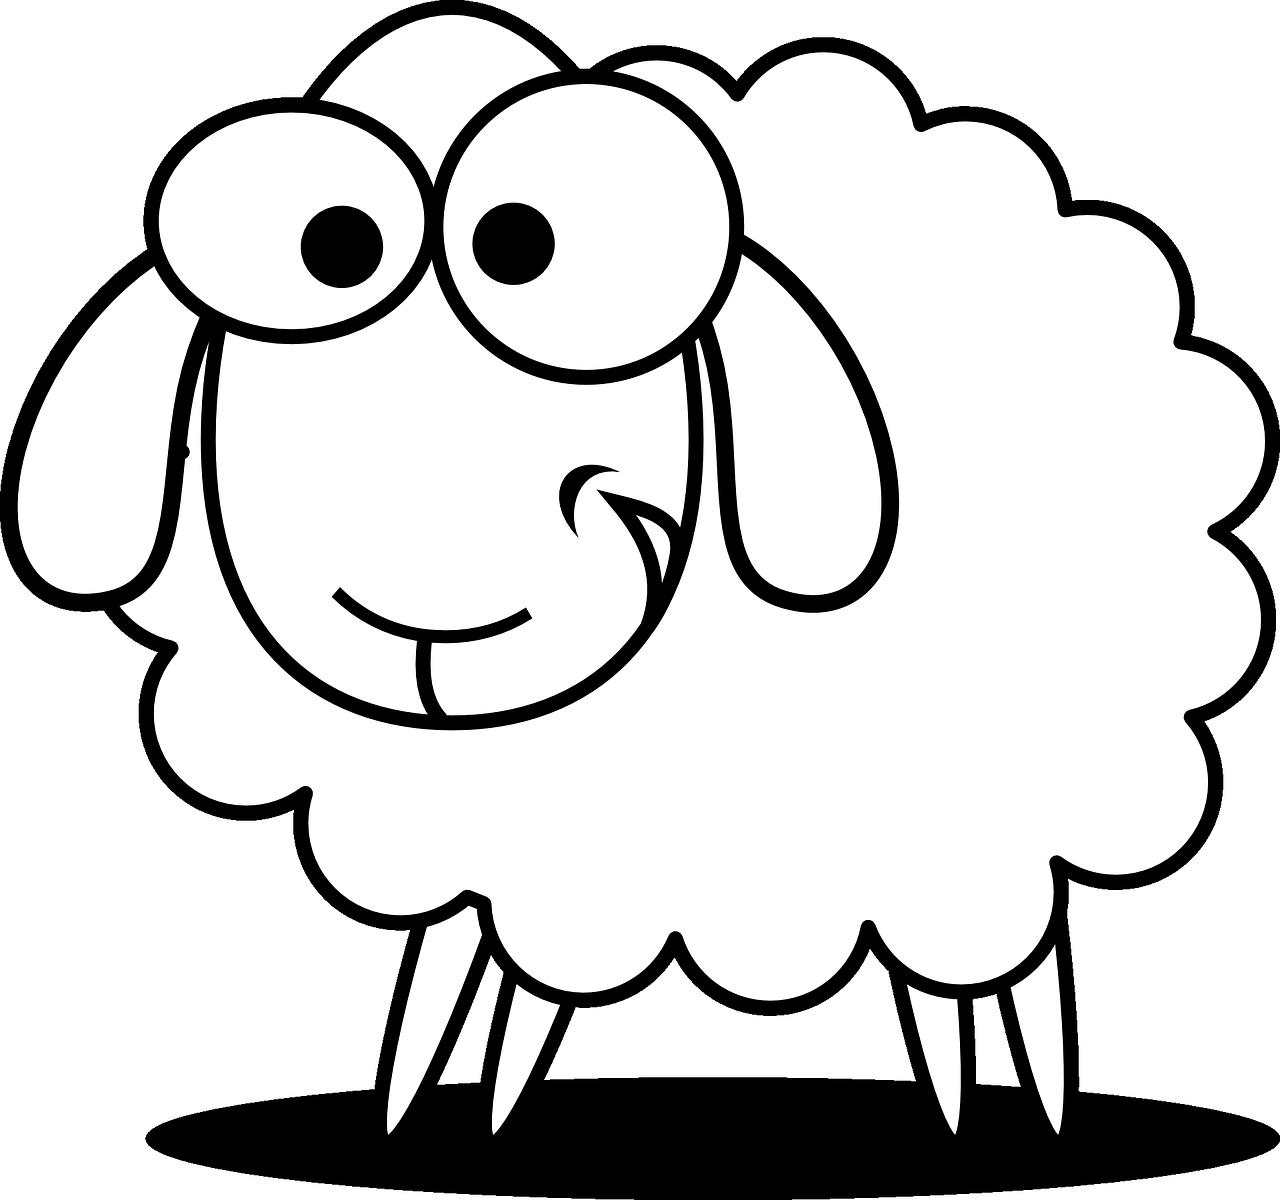 Lamb clipart scared. Free image on pixabay